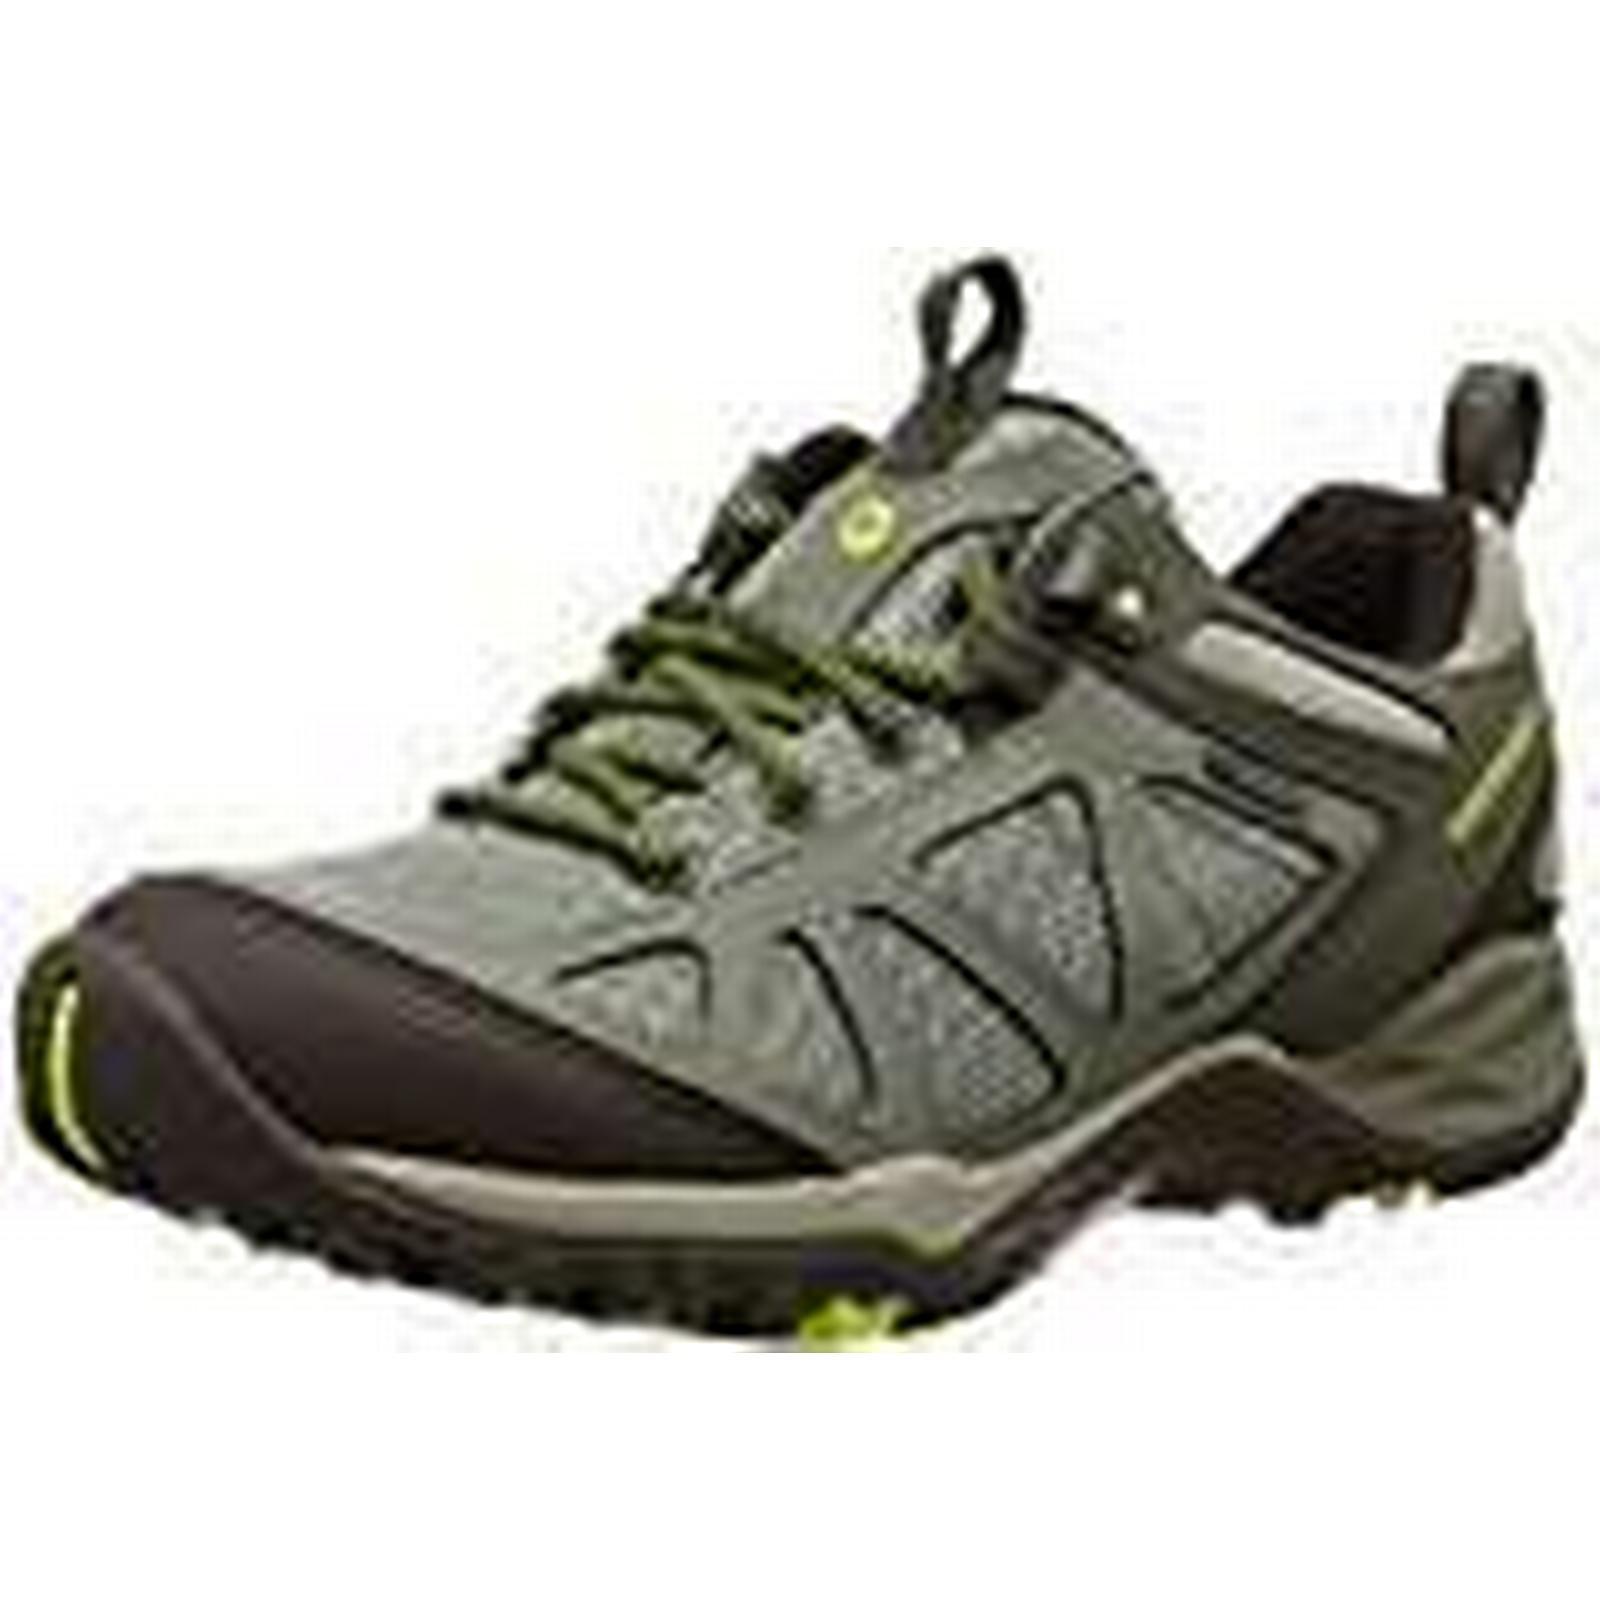 Merrell Women's Siren Sport Hiking Q2 Gtx Low Rise Hiking Sport Boots, Green (Dusty Olive), 8 UK 42 EU a12fdf